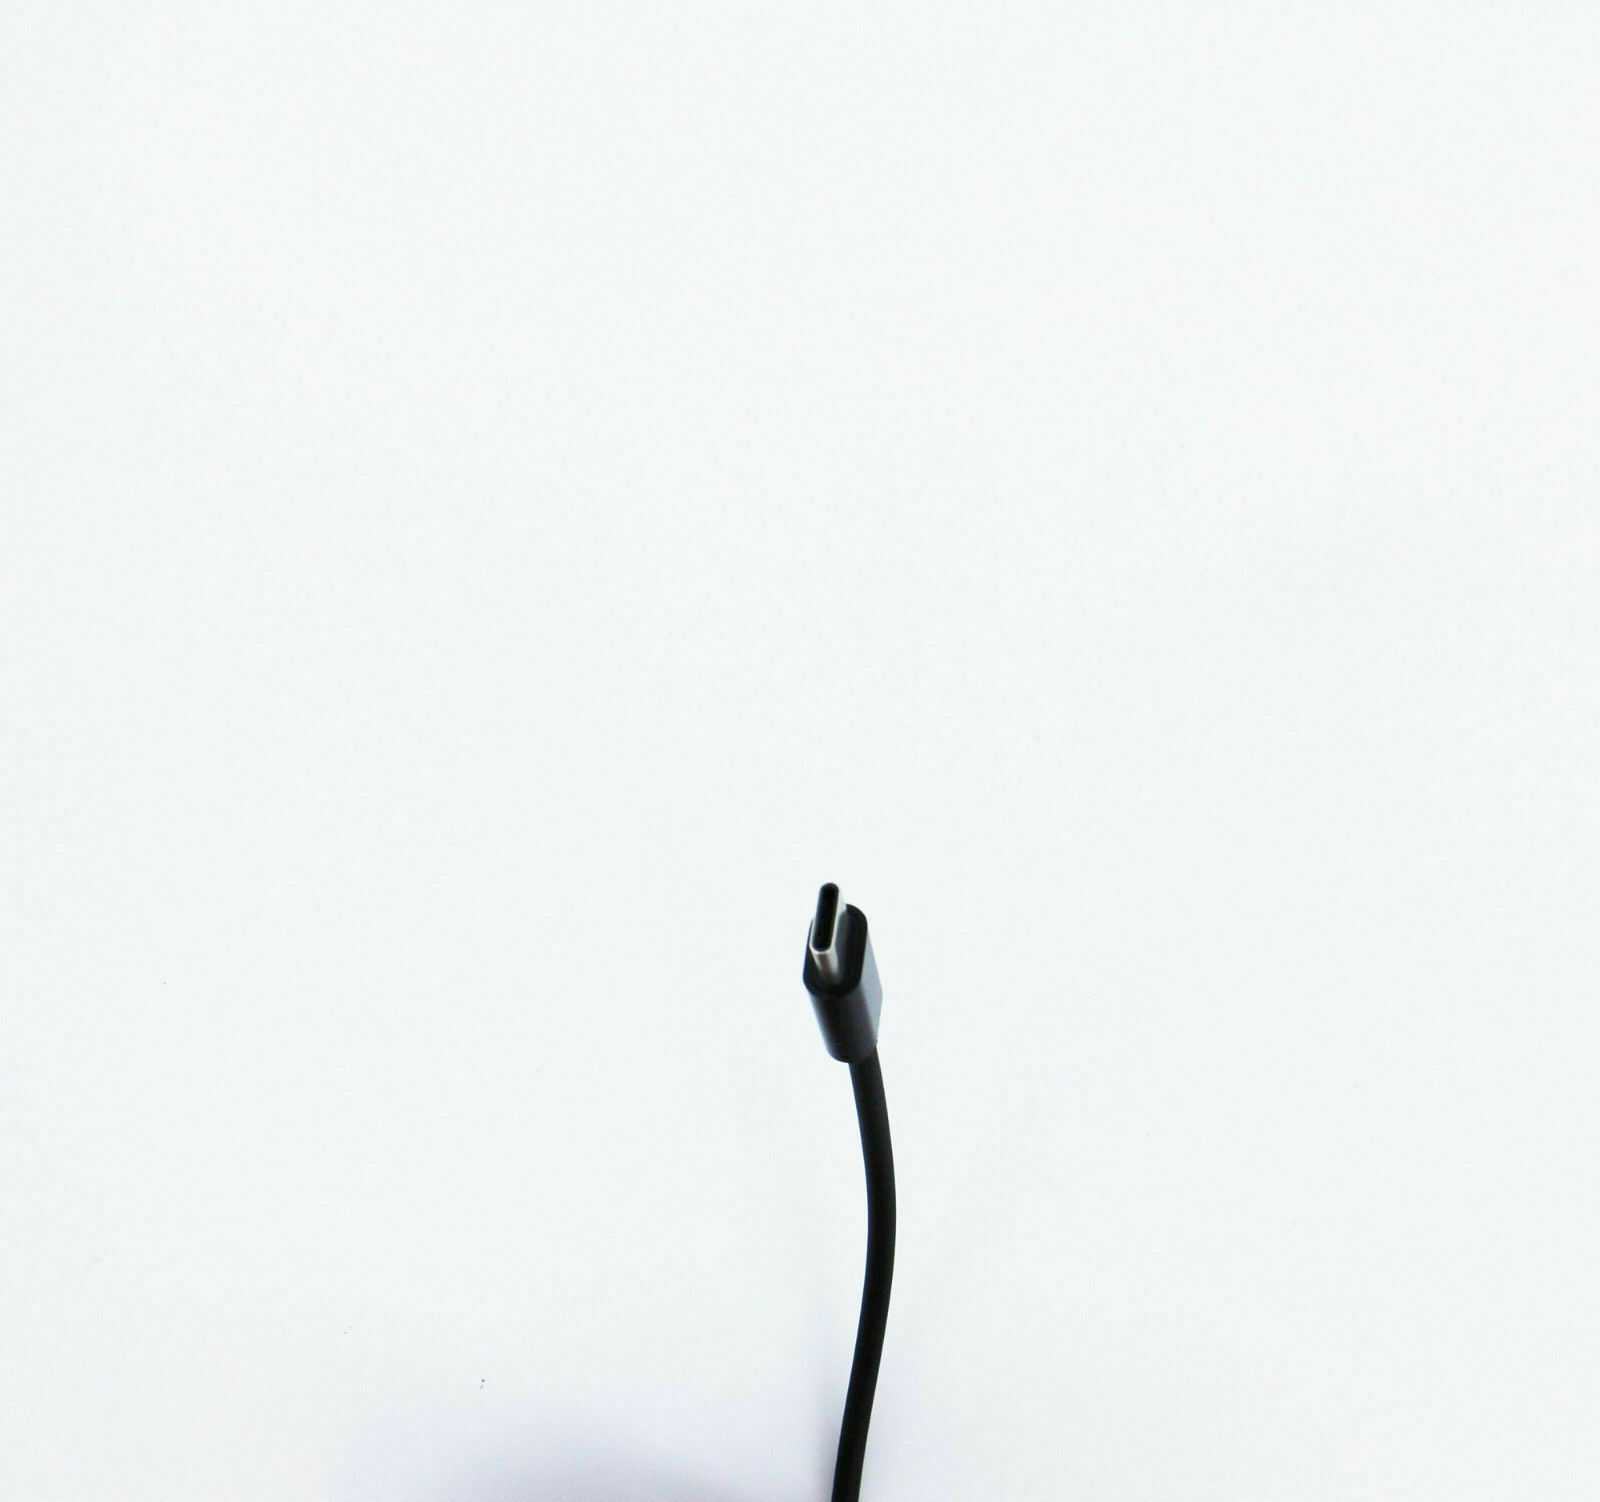 USB Type-C Car Charger for Motorola Moto Z4 Force Moto Z3 / Z3 Play Moto Z2 Play image 3